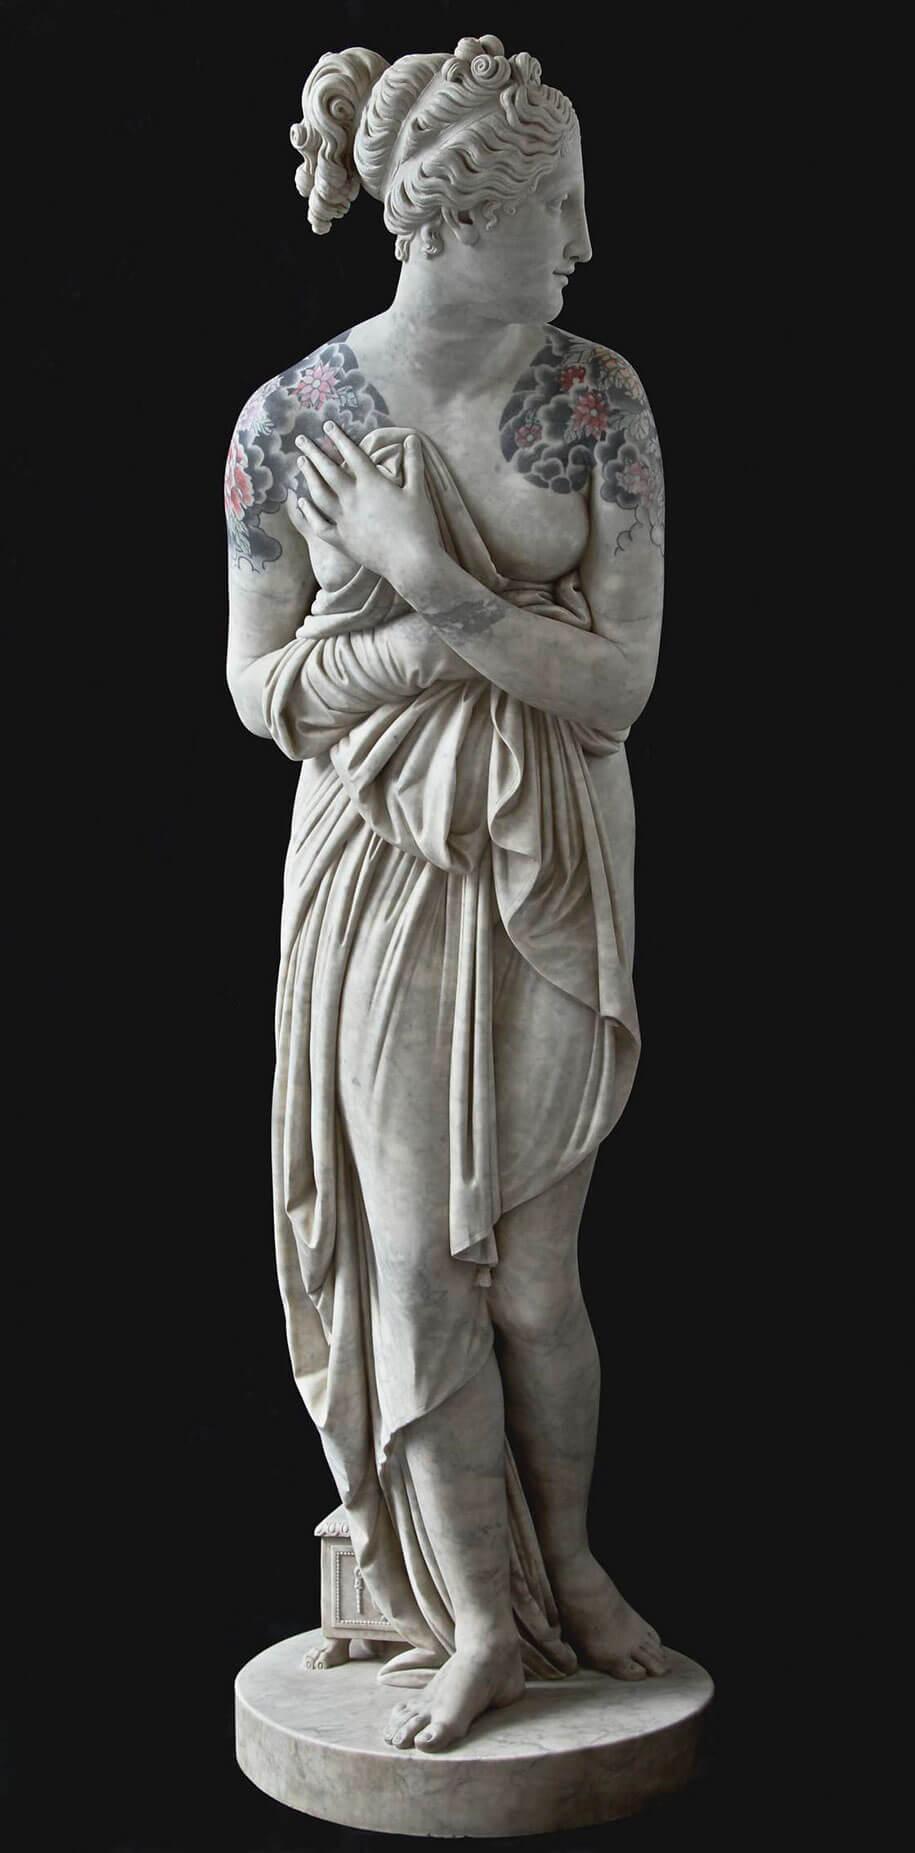 italian artist gives classical sculptures criminal tattoos fy 10